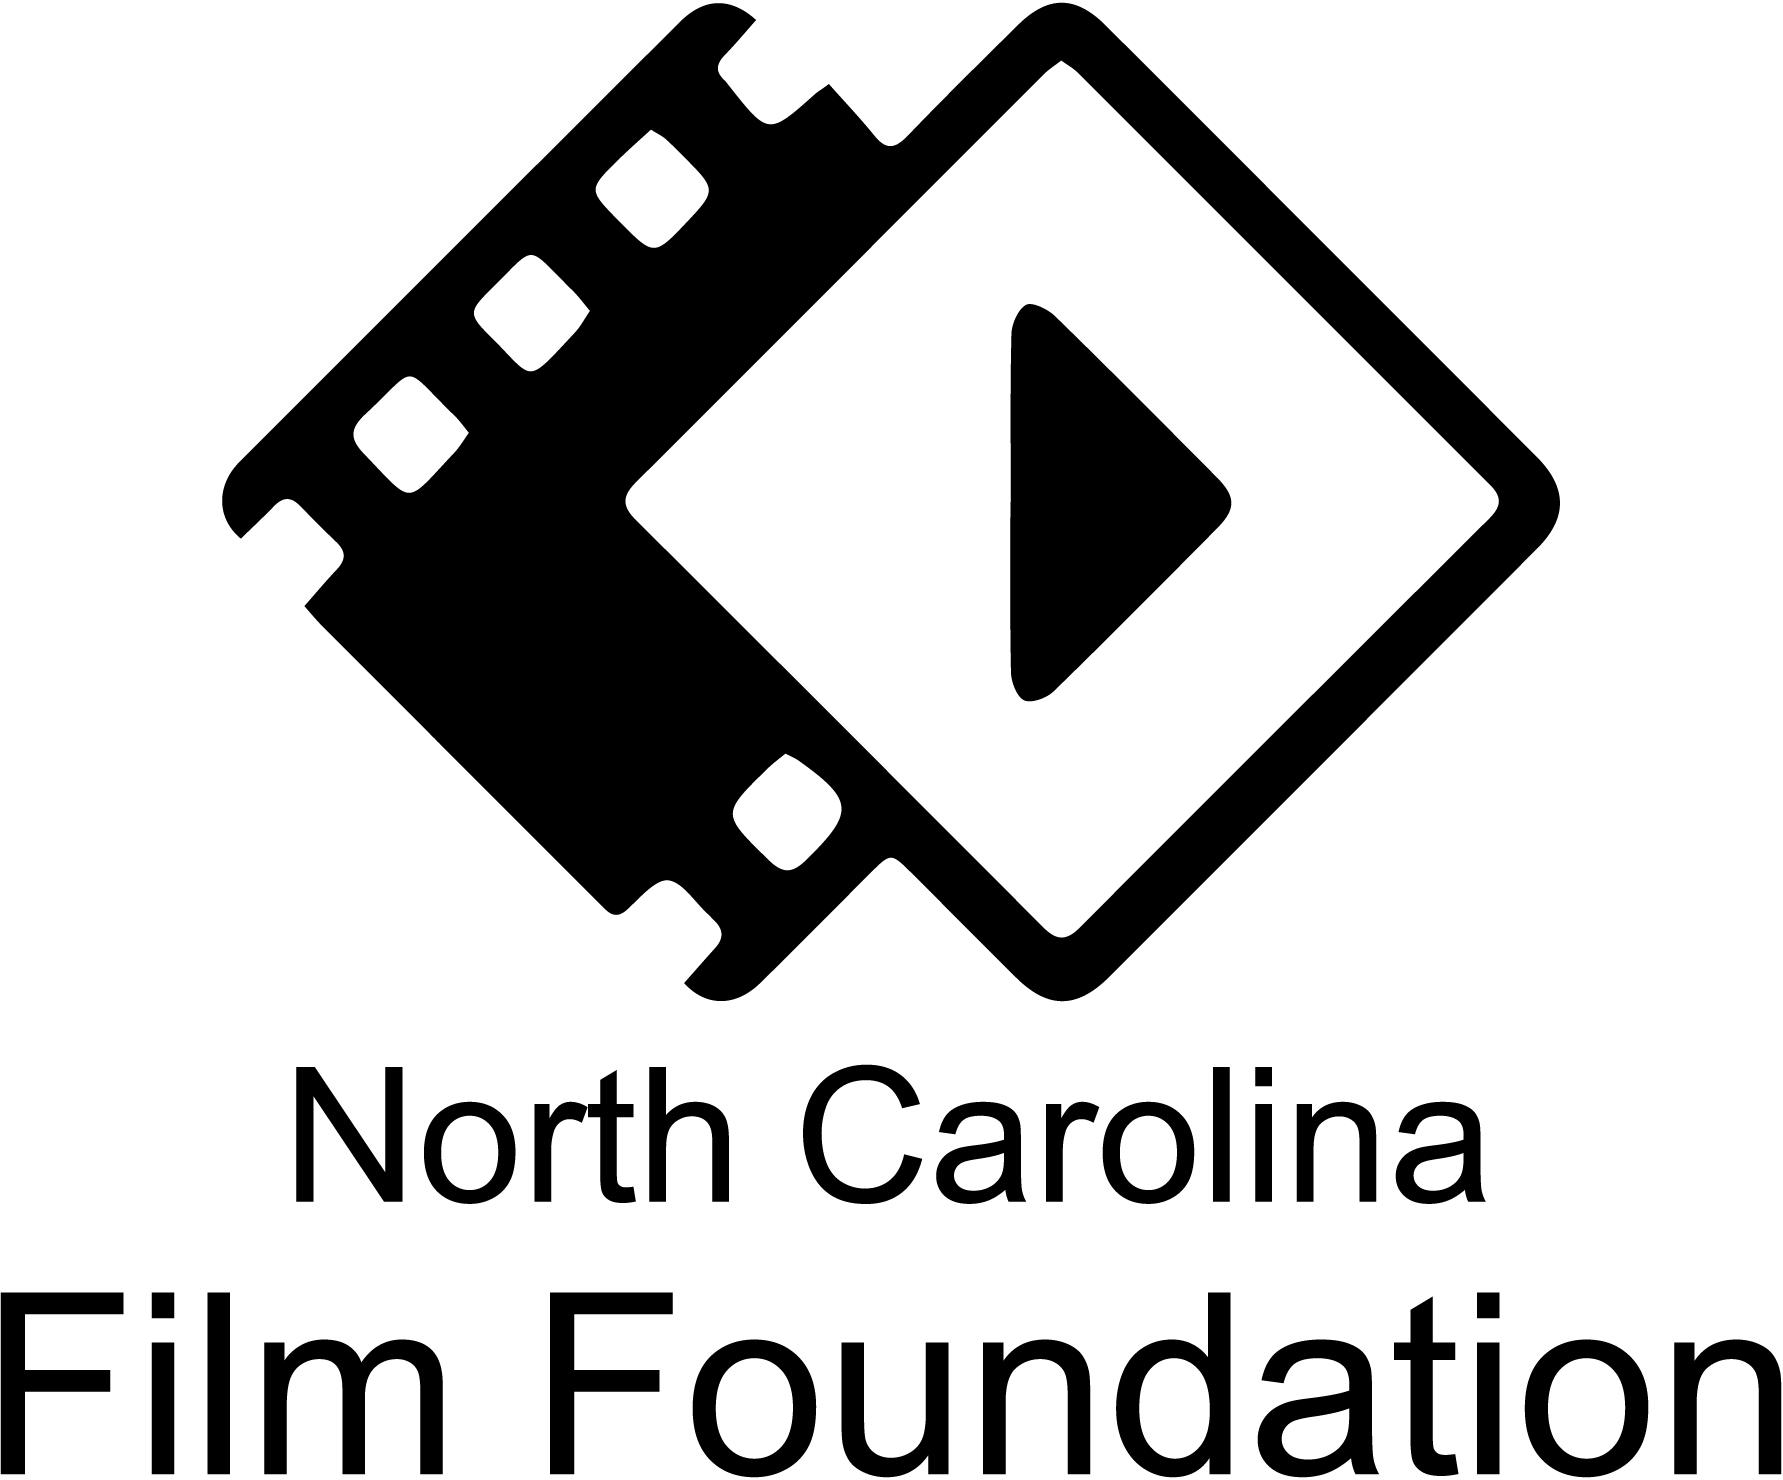 North Carolina Film Foundation